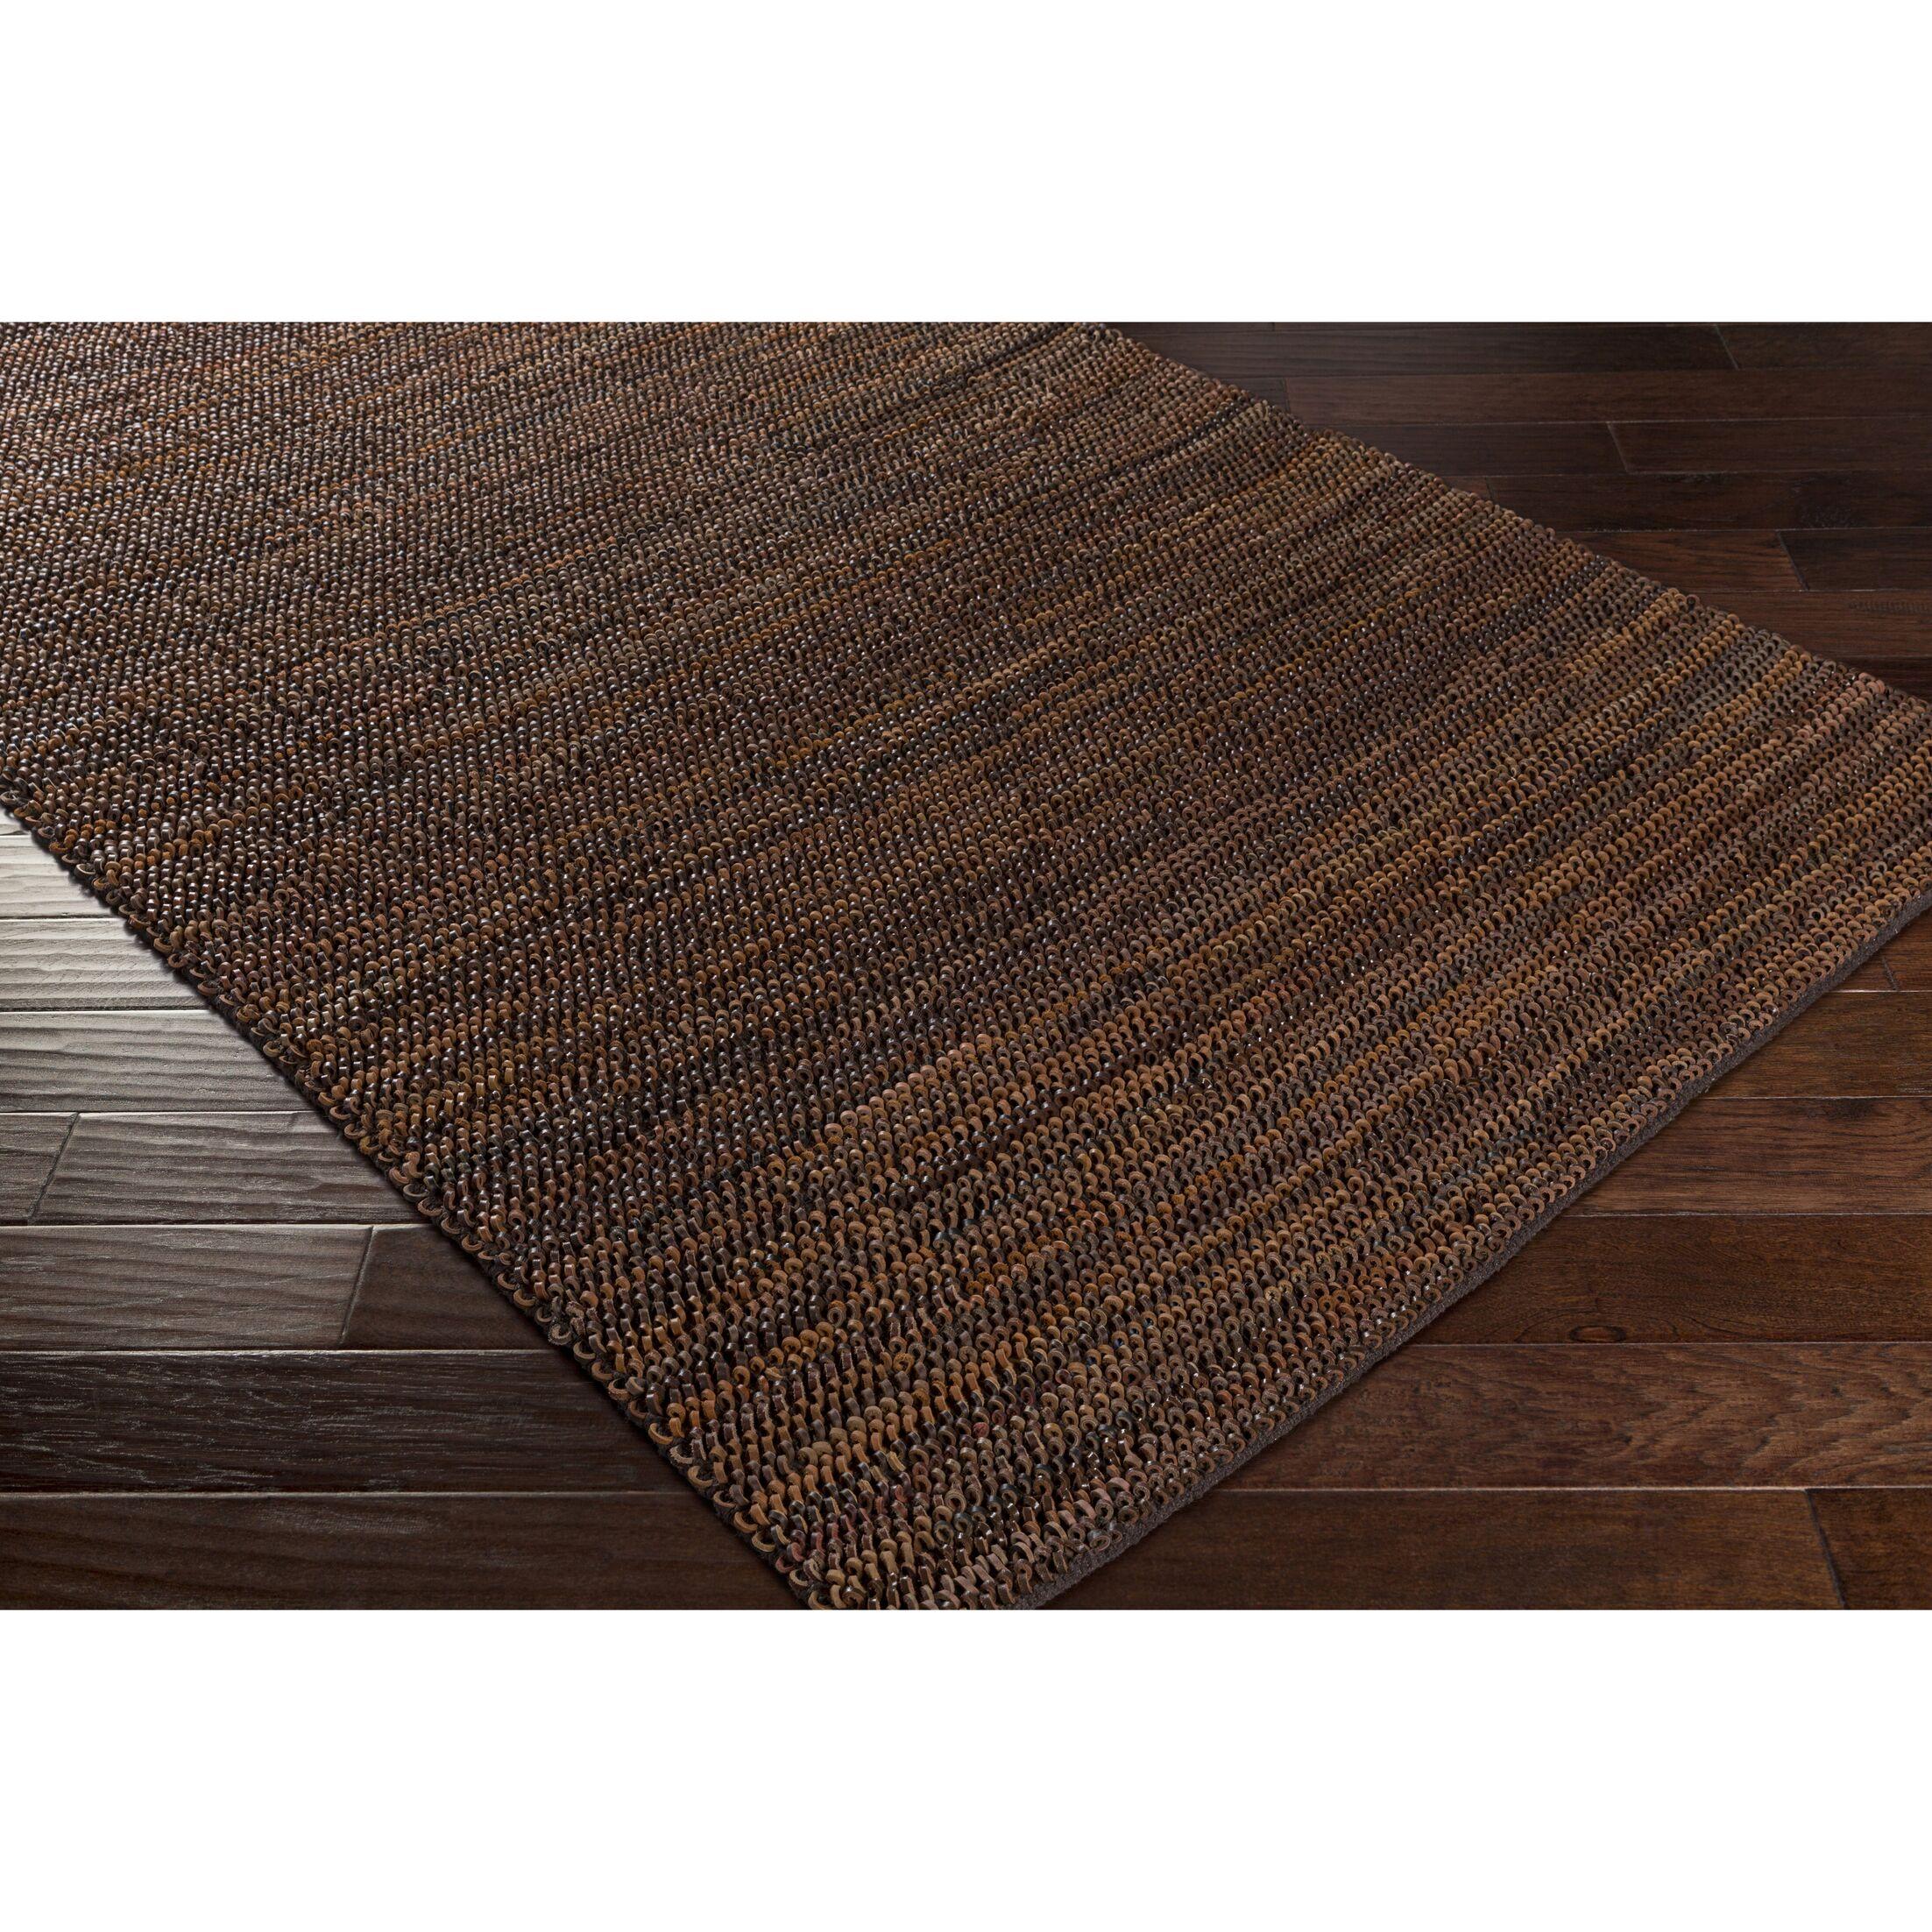 Desousa Hand-Woven Brown Area Rug Rug Size: Rectangle 5' x 7'6